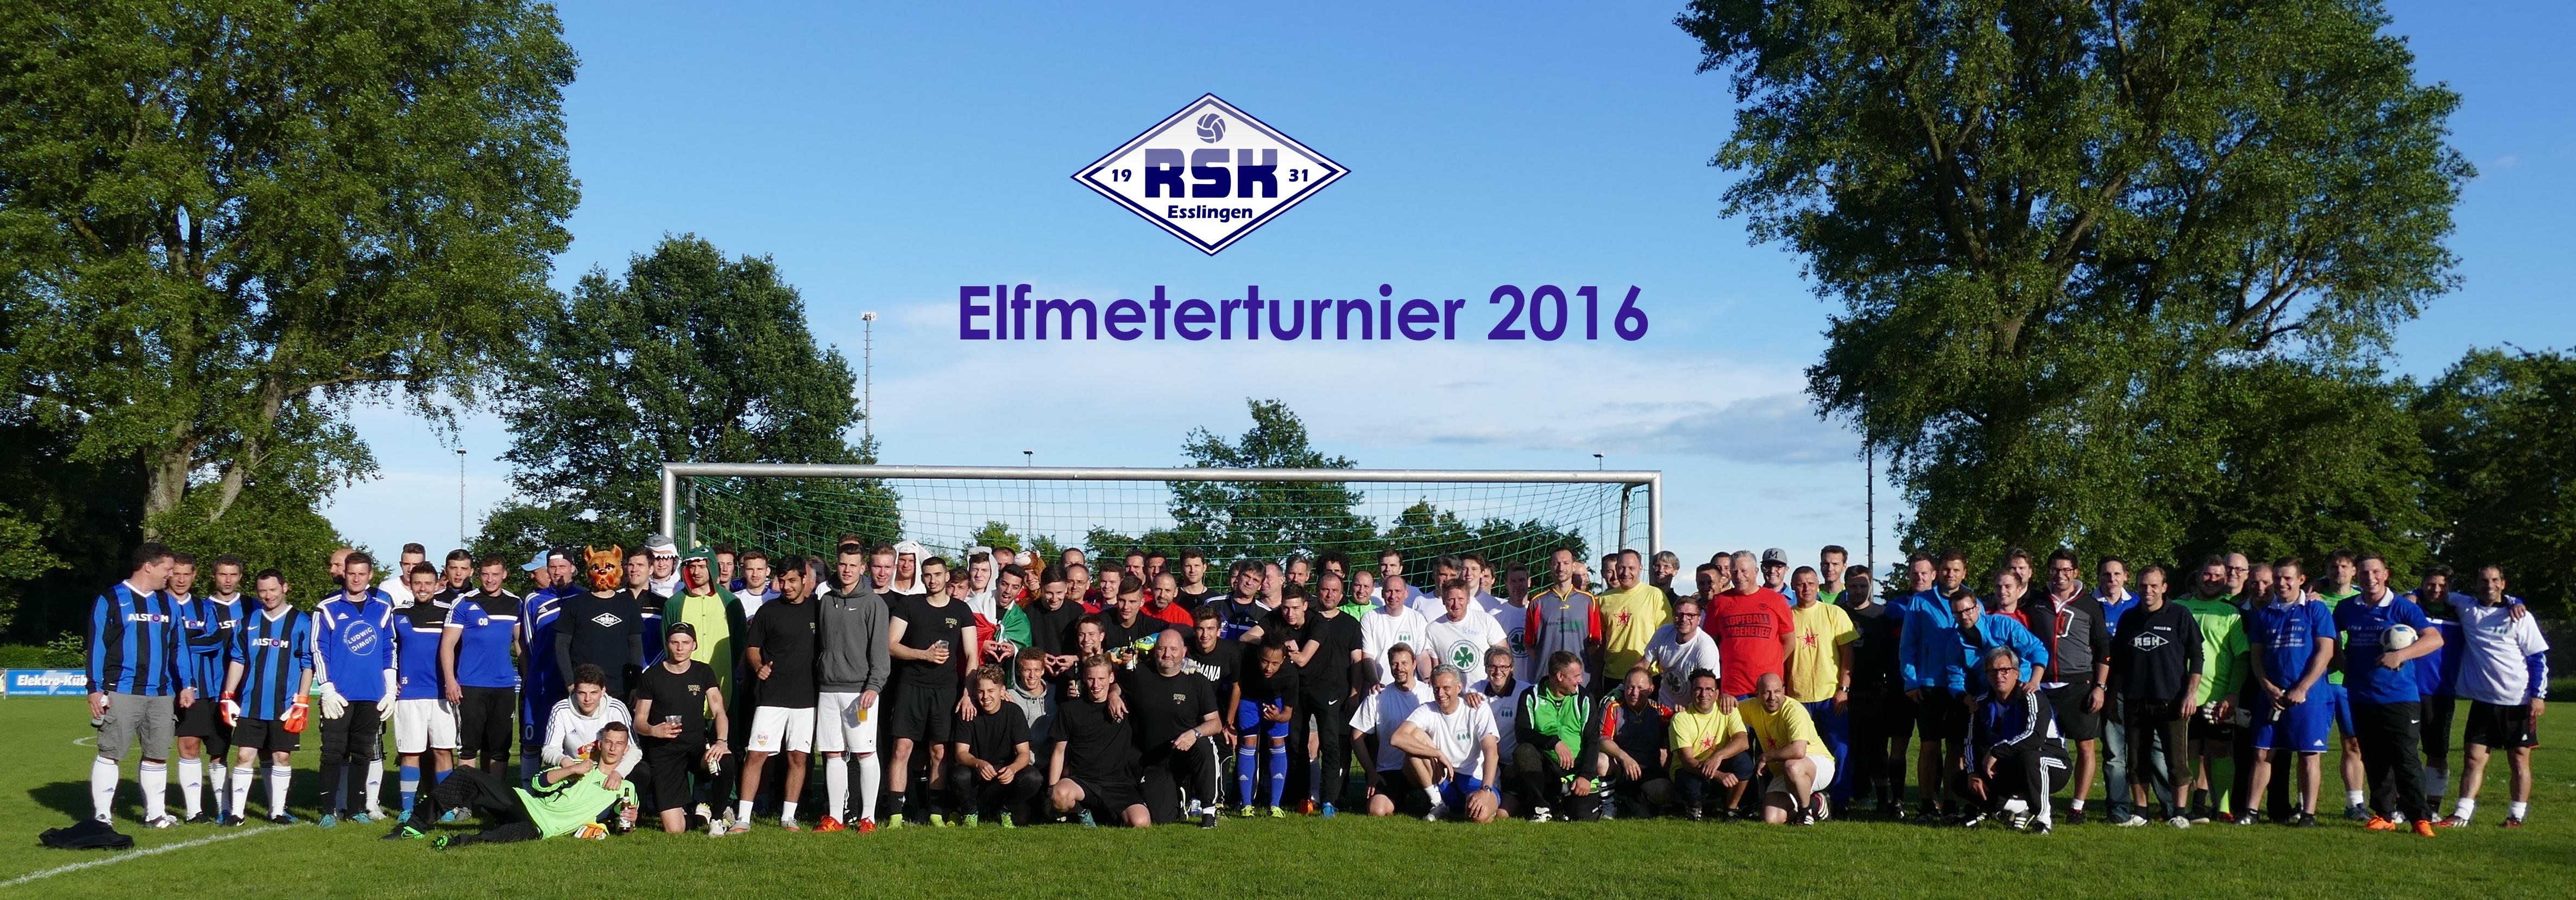 2016.06.17 P1290325 Gesamtbild Elfmeterturnier 2016